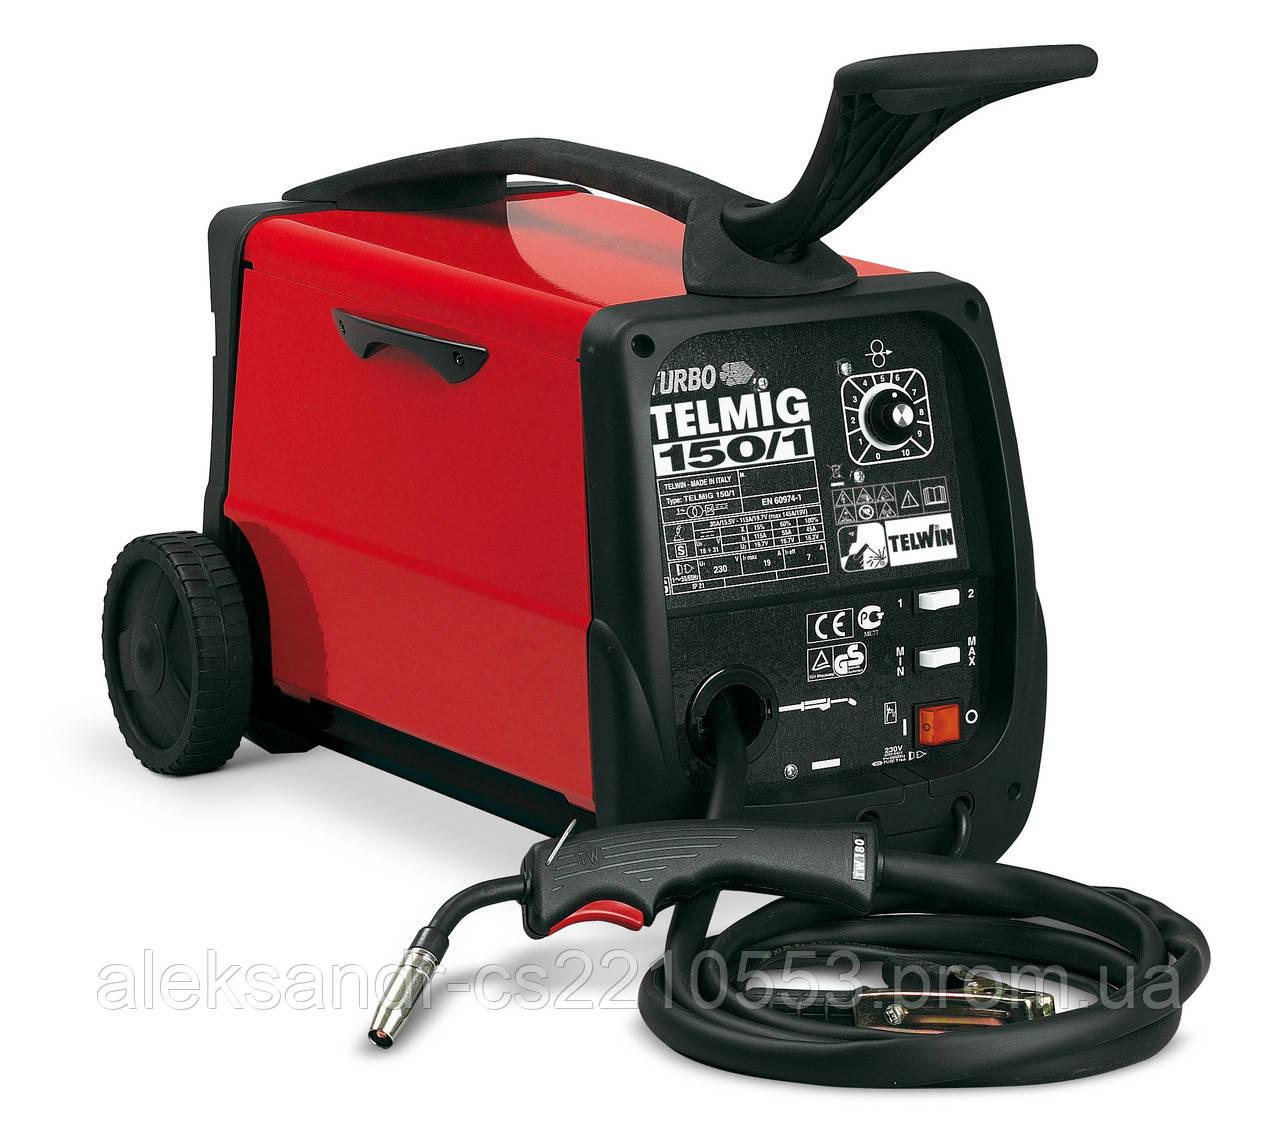 Telwin Telmig 150/1 Turbo - Сварочный полуавтомат 30-145 А